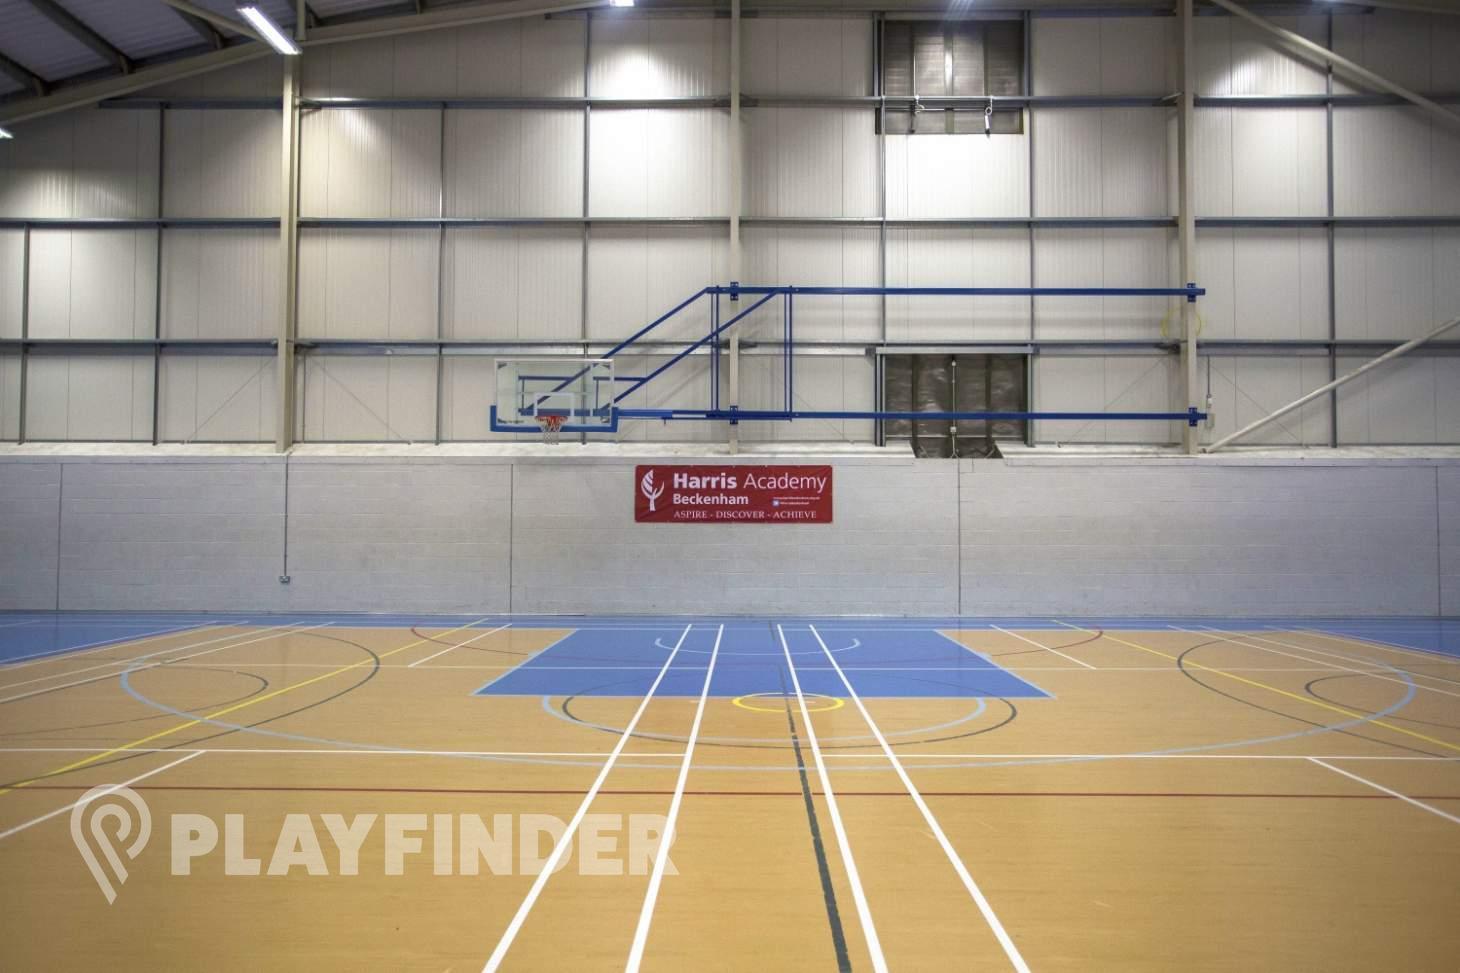 Harris Academy Beckenham Indoor basketball court